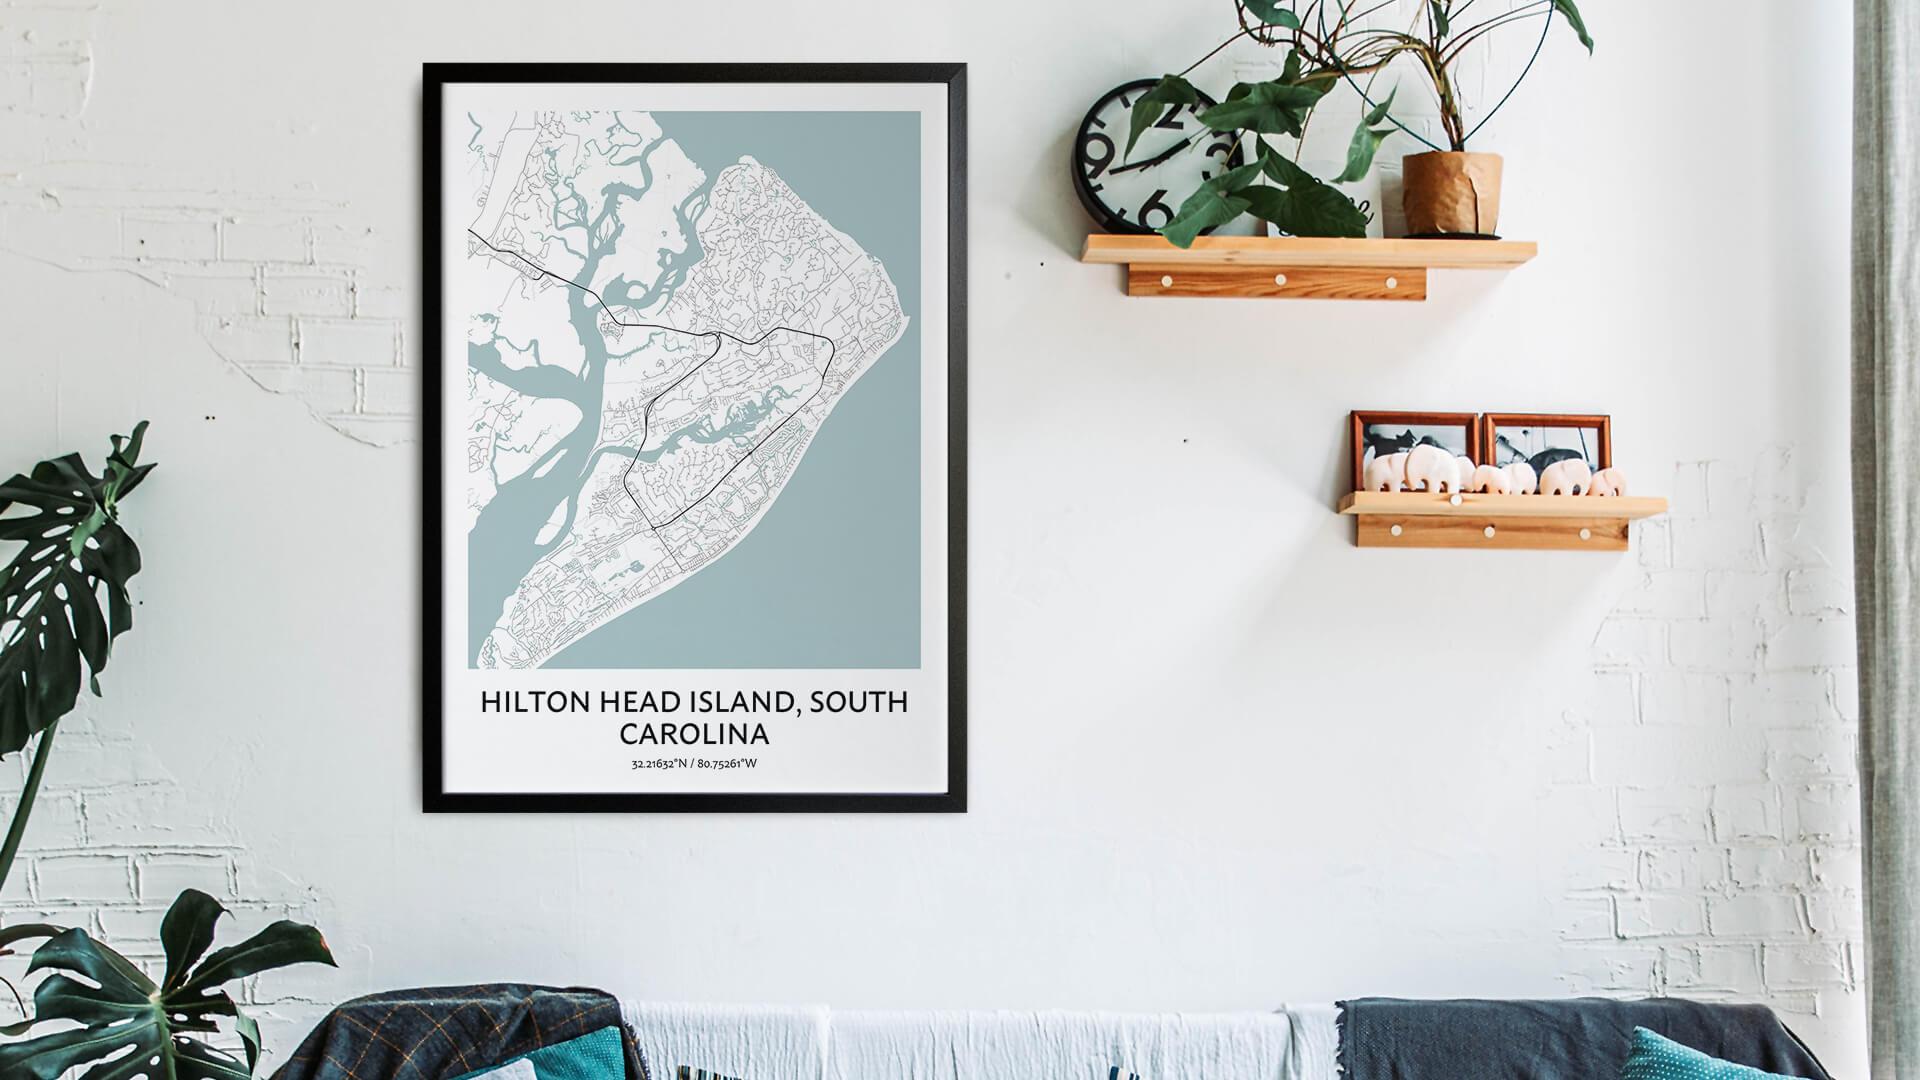 Hilton Head Island map art